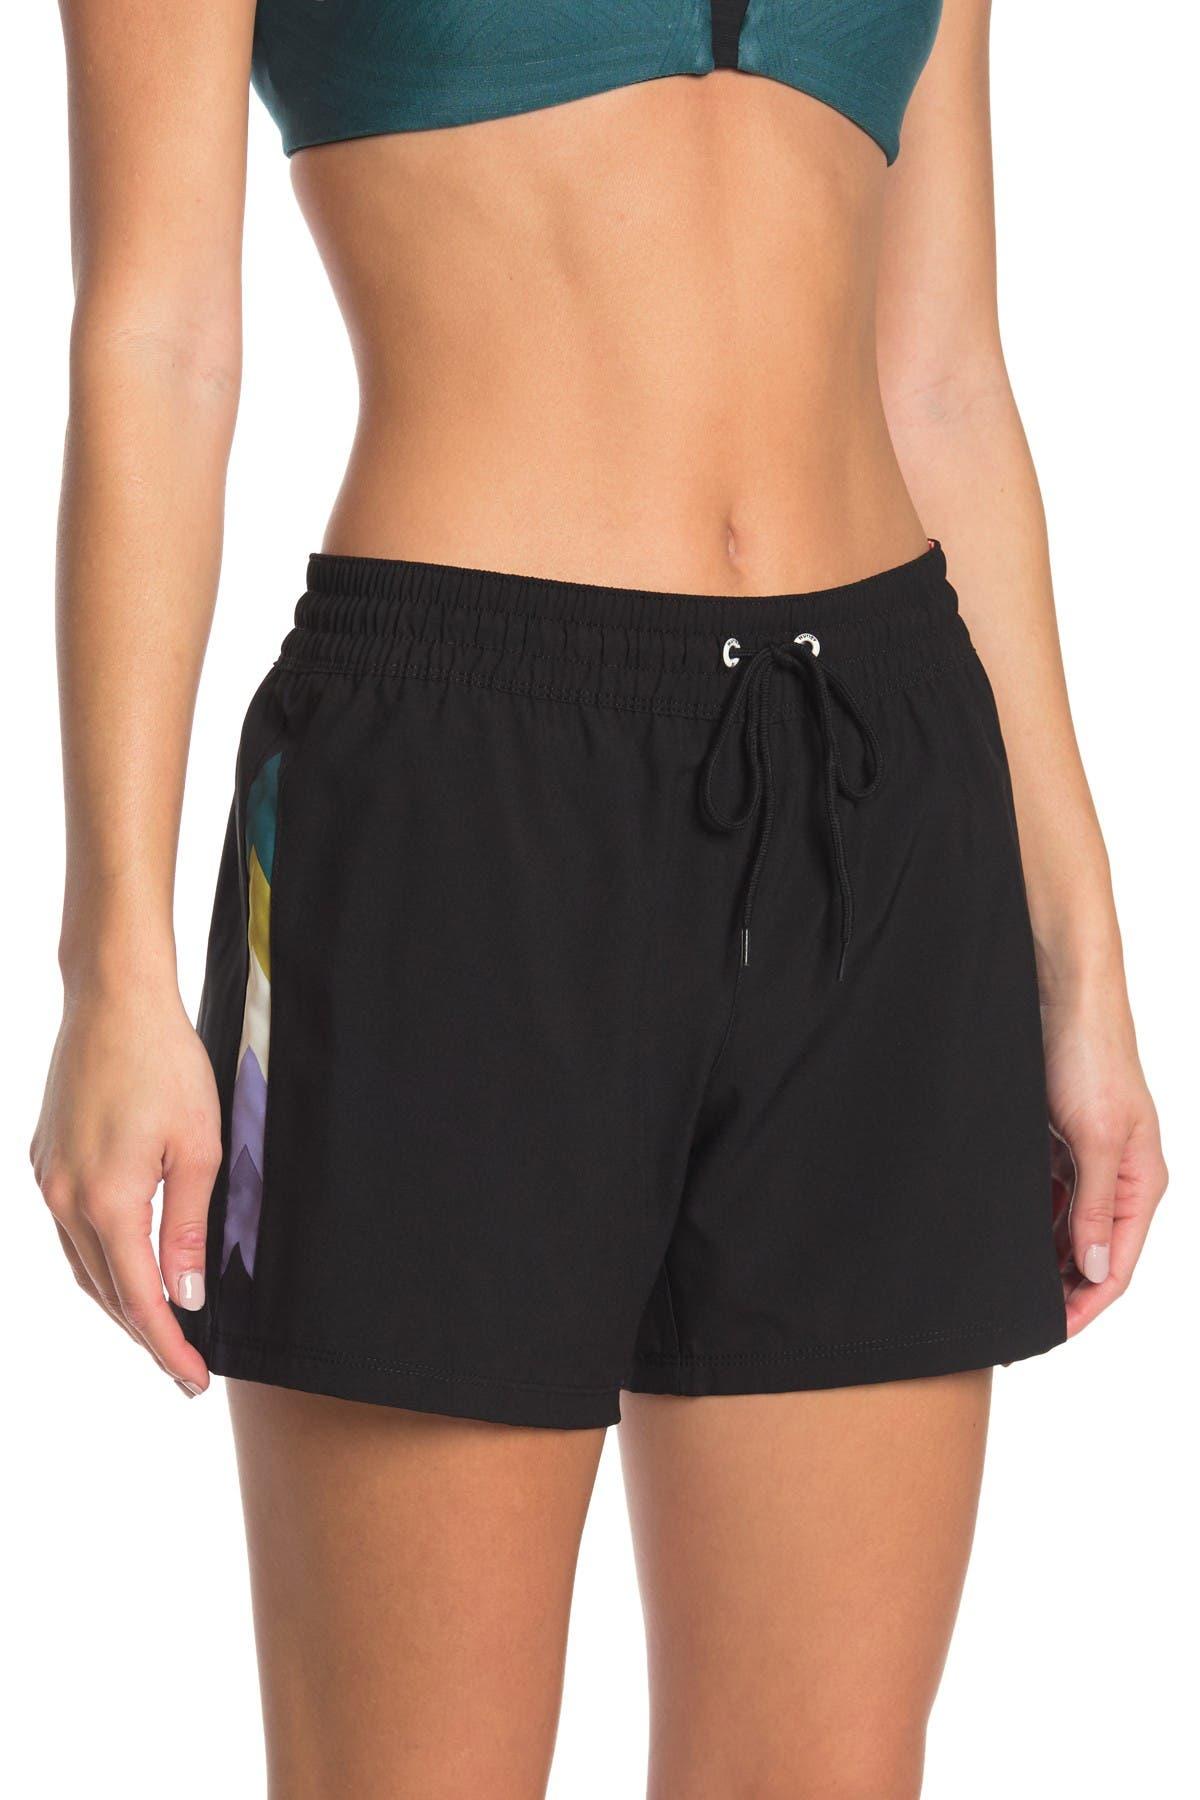 Image of Hurley Supersuede Playa 5 Volley Shorts